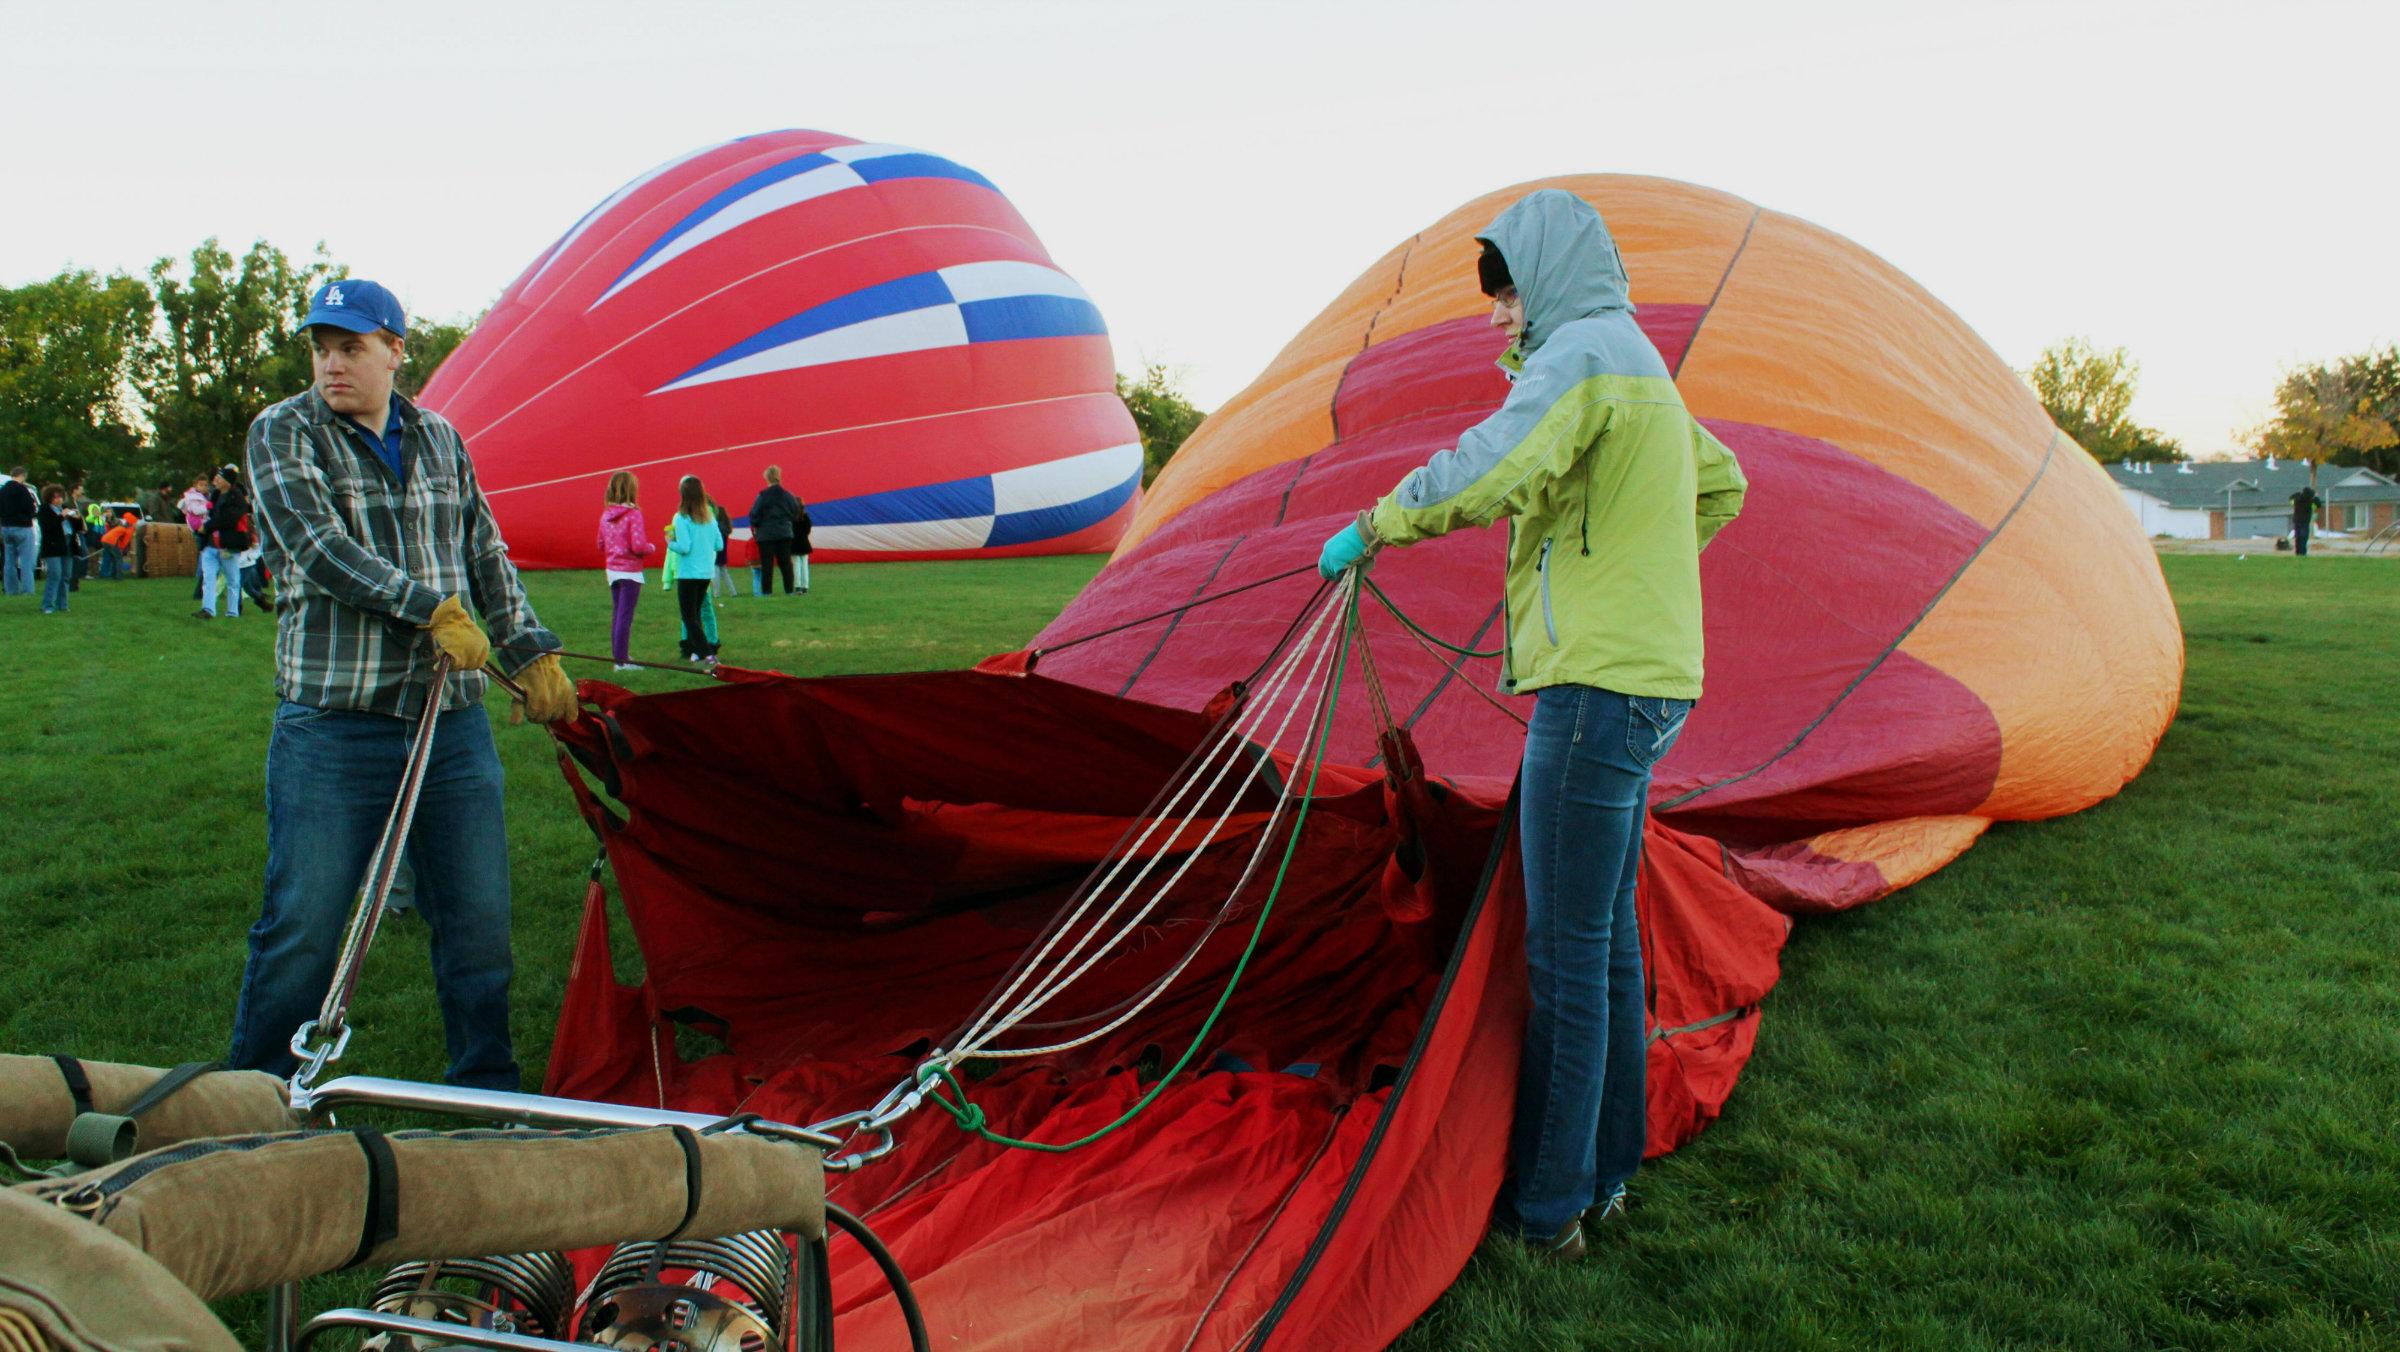 Crew members inflate a hot air balloon during the 2014 Albuquerque International Balloon Fiesta.